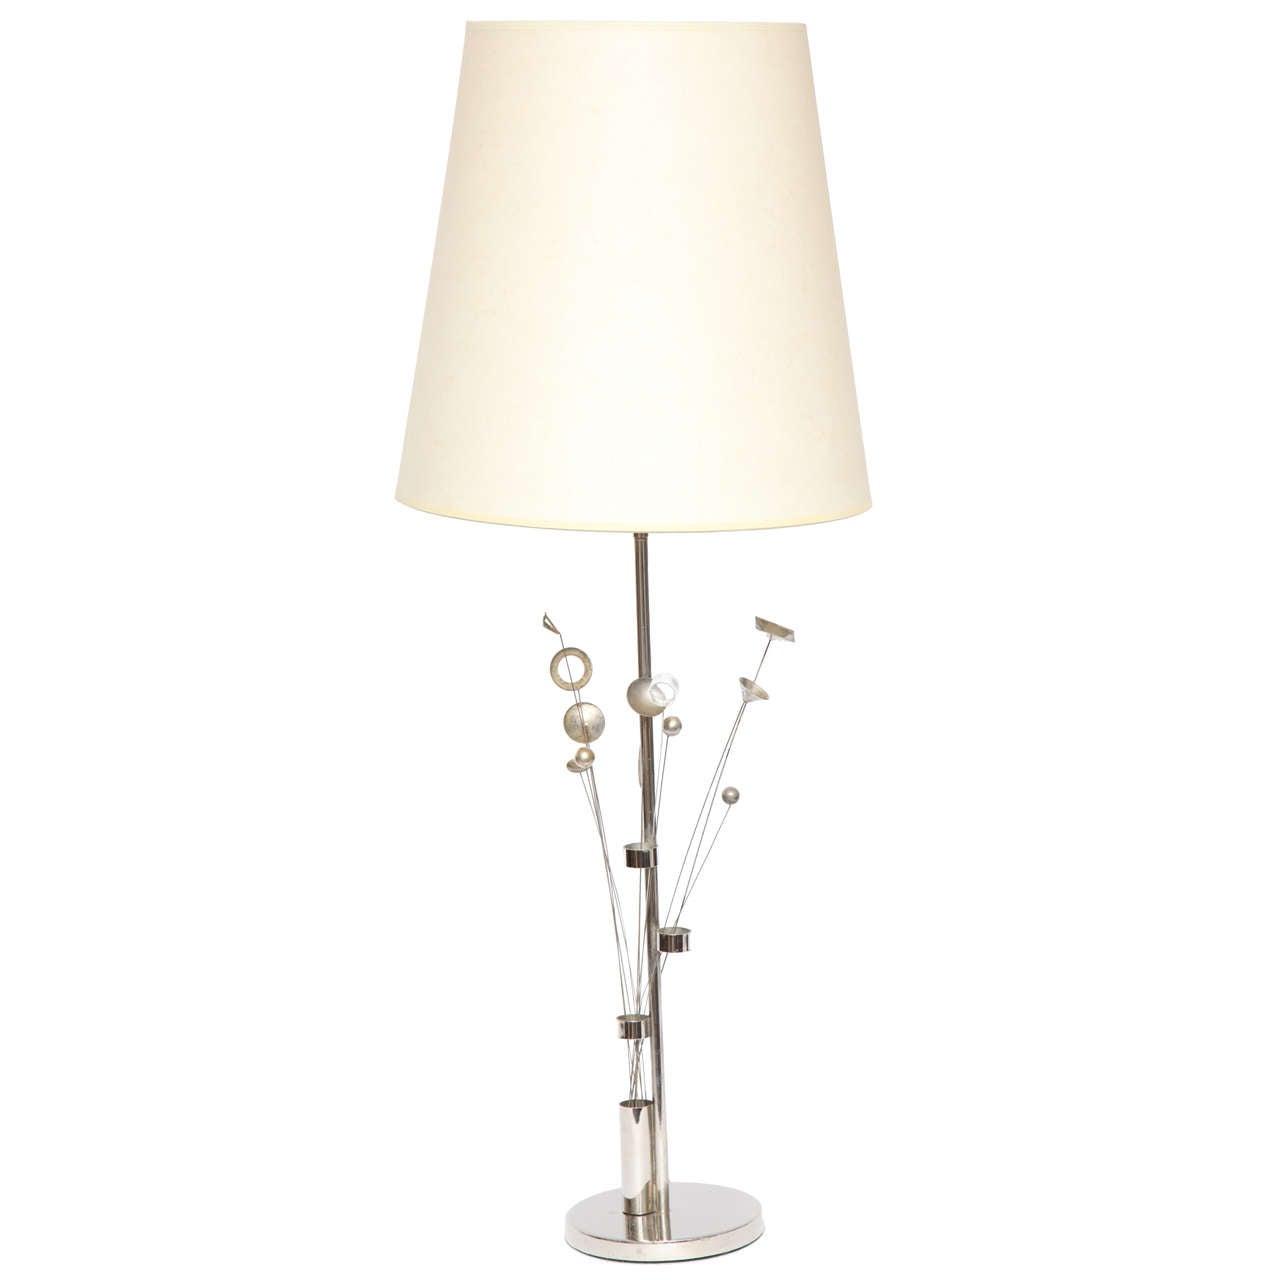 1960s Italian Sculptural Kinetic Table Lamp